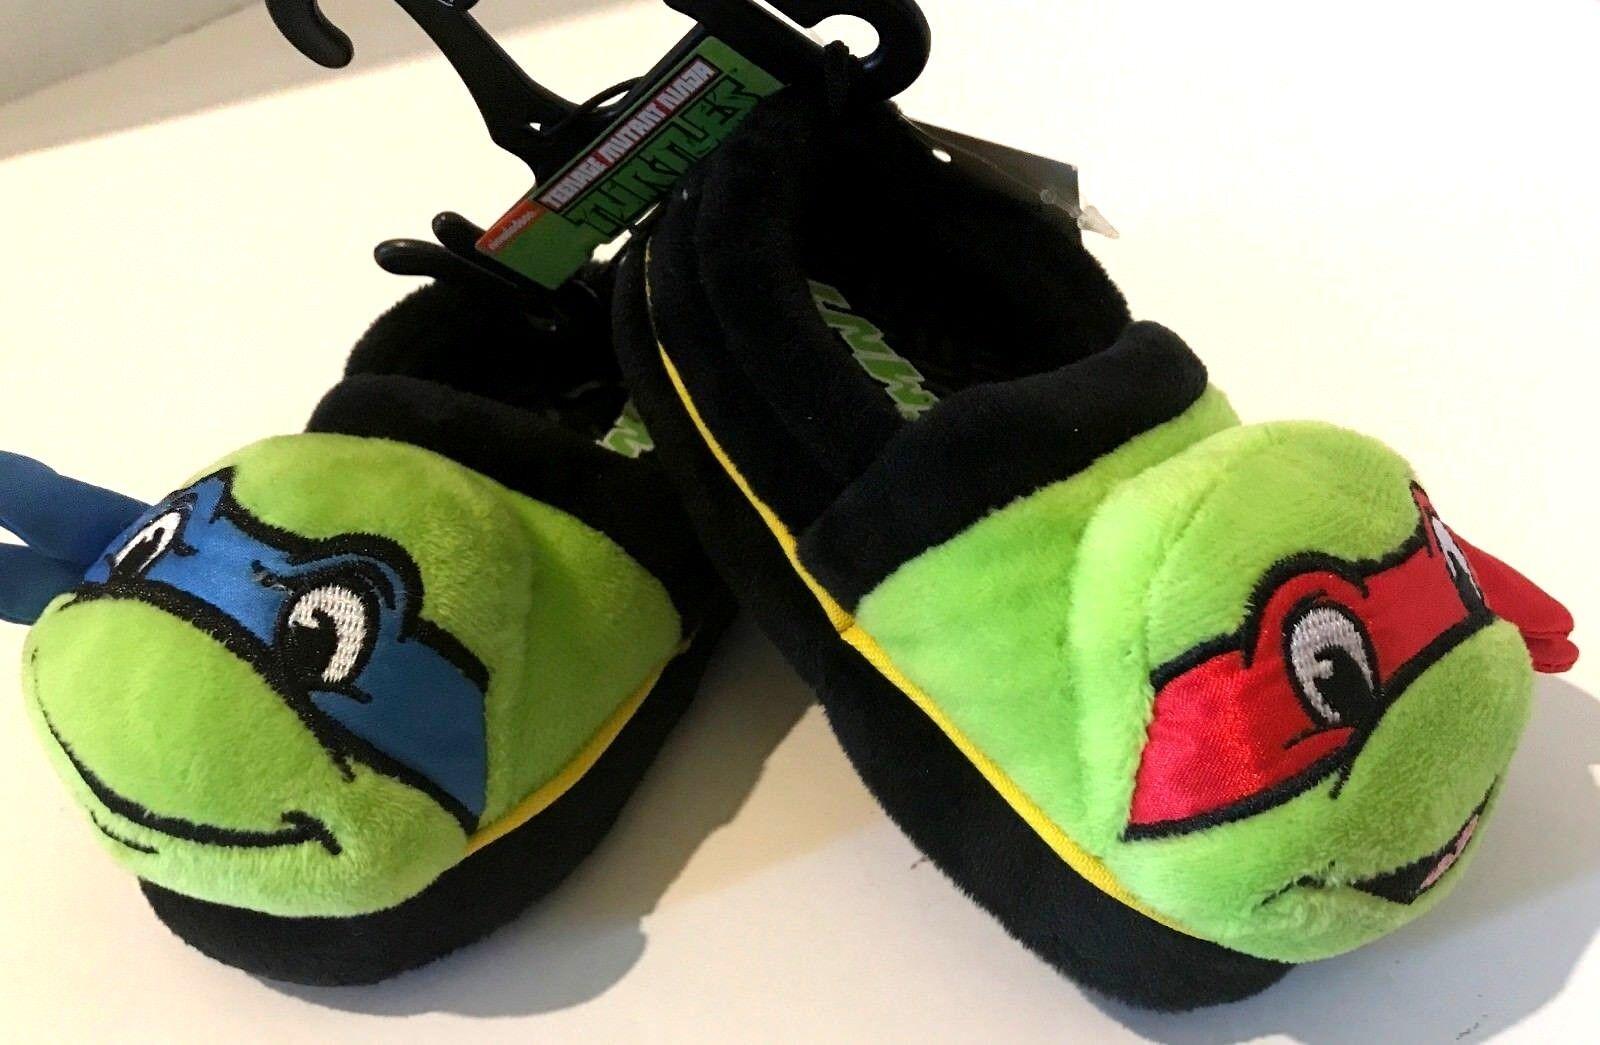 d1cfe74e768 Nickelodeon Boys Teenage Mutant Ninja Turtles Slippers TMNT Power ...